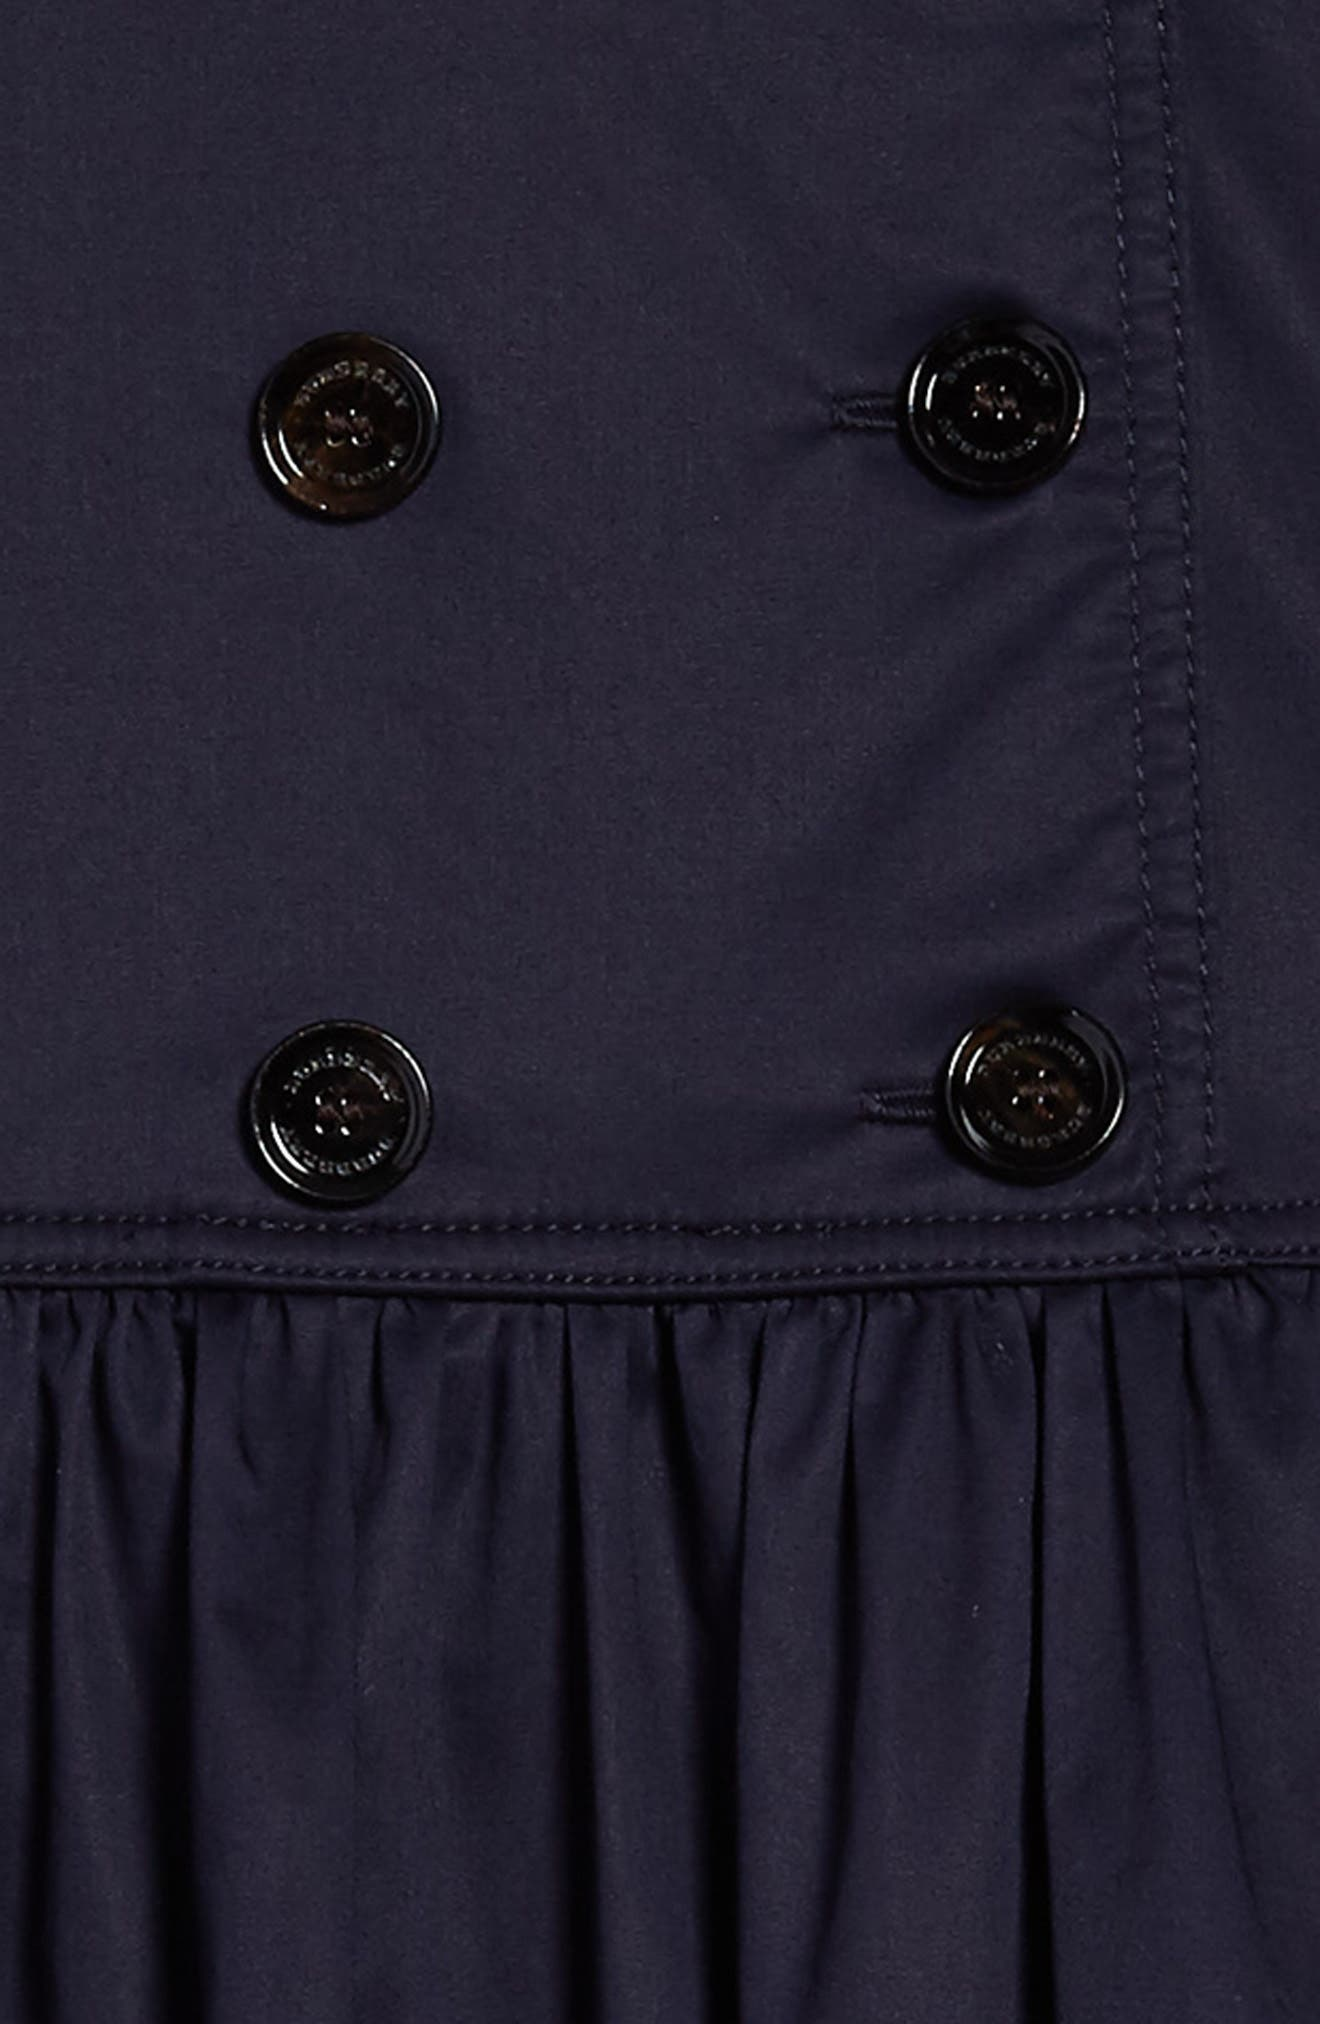 Lillyana Trench Dress,                             Alternate thumbnail 3, color,                             Midnight Blue